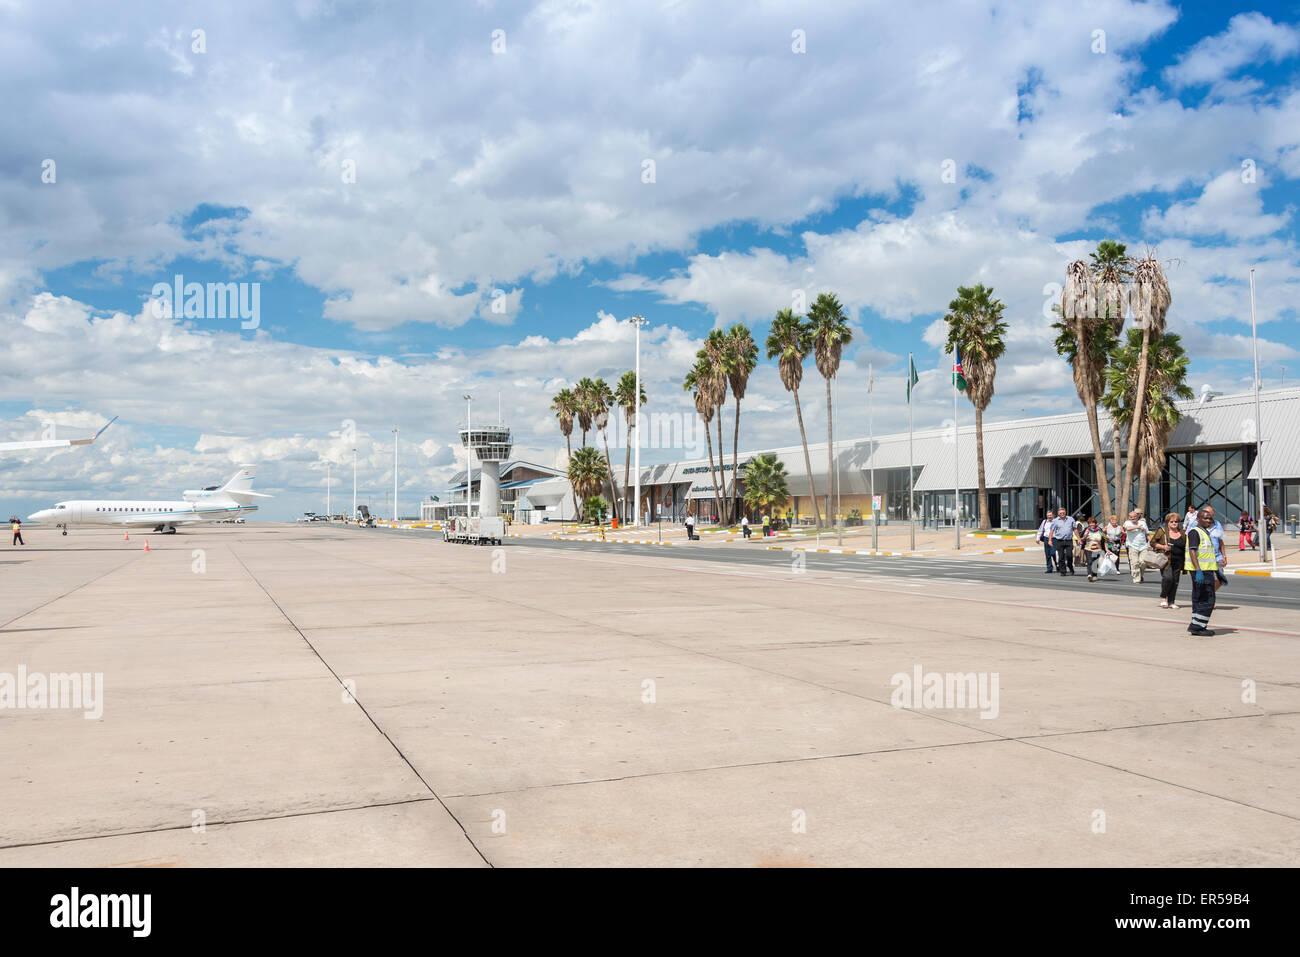 Hosea Kutako International Airport, Windhoek (Windhuk), Khomas Region, Republic of Namibia - Stock Image